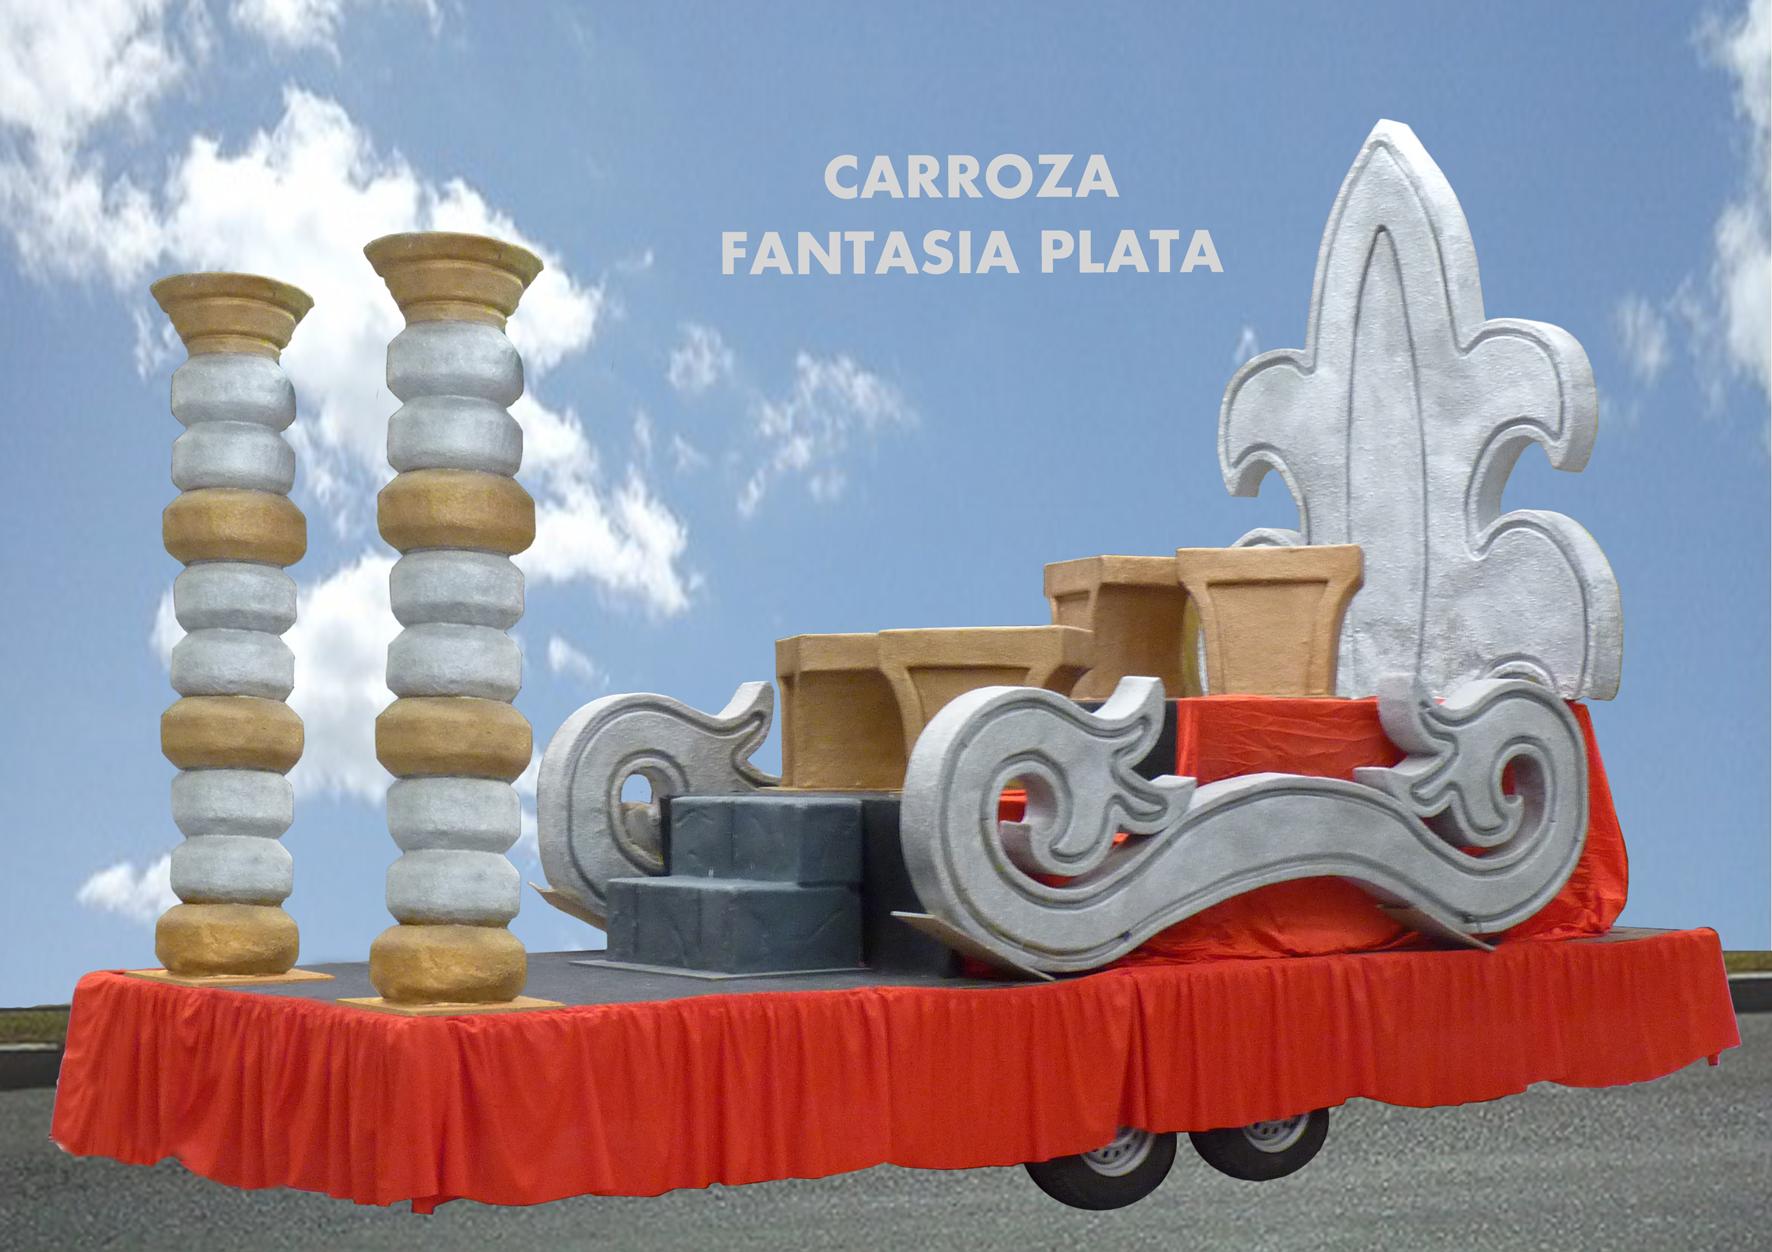 Carroza Reyes Magos Fantasía PLata